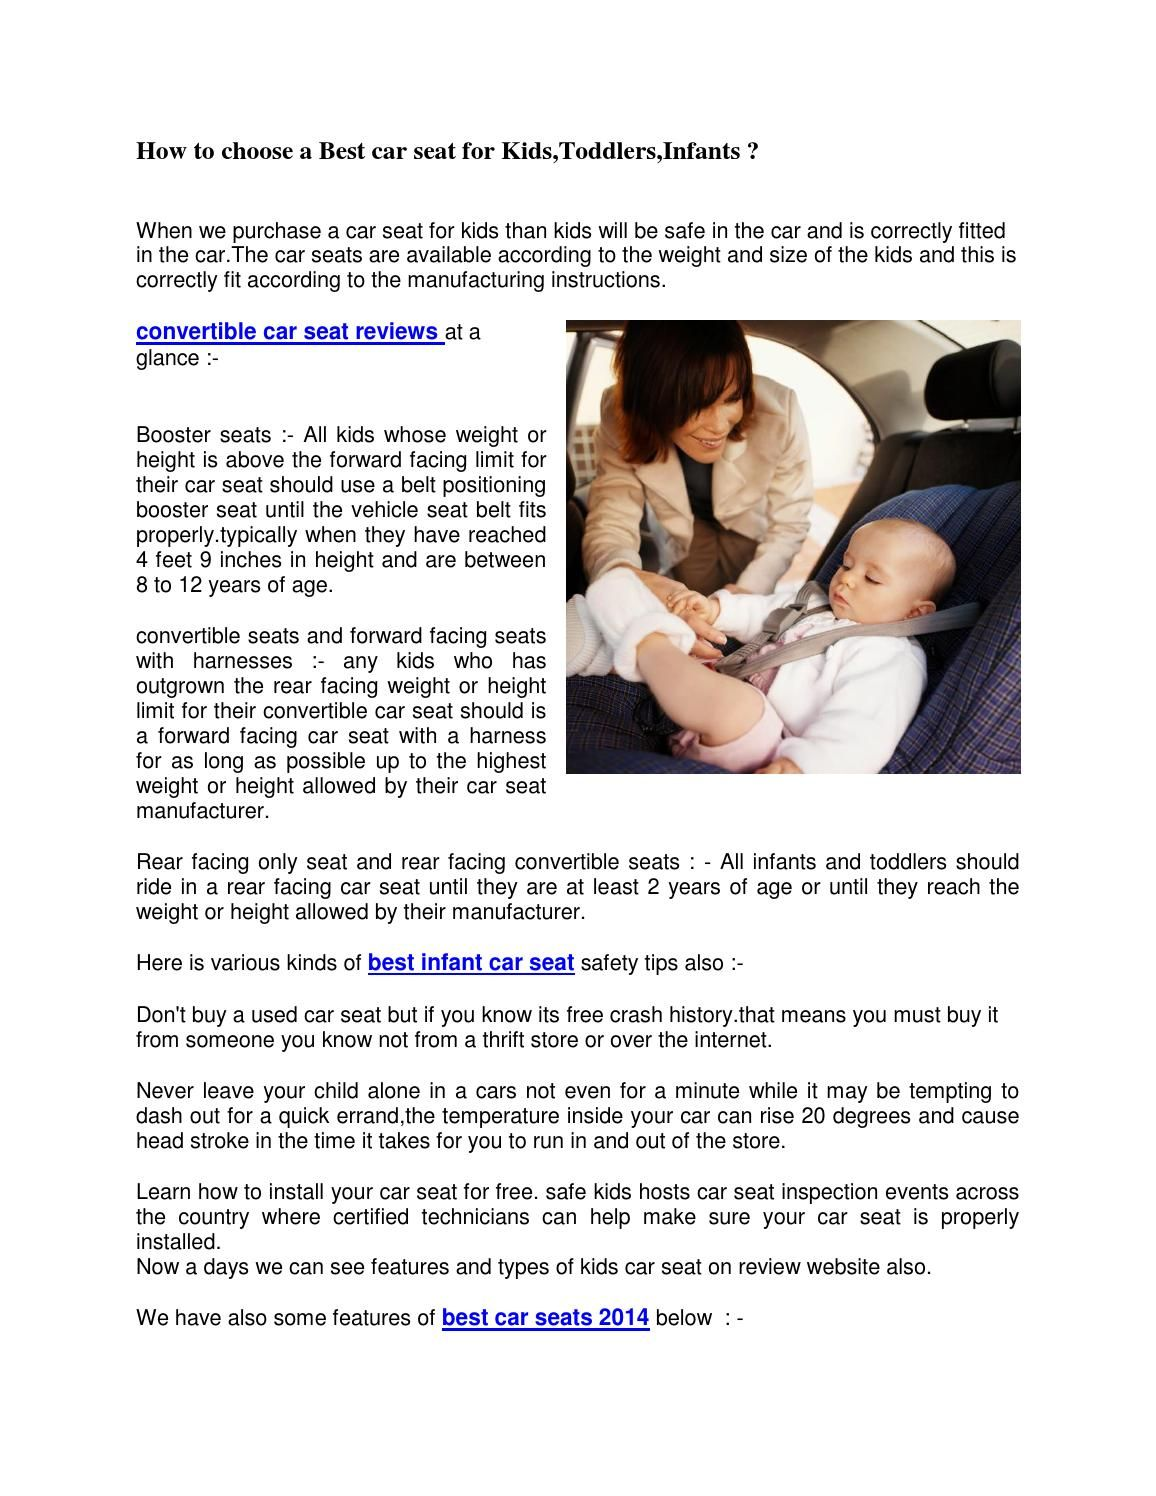 how to choose a best car seat for kidstoddlersinfants bambini ai primi passi auto e bambino